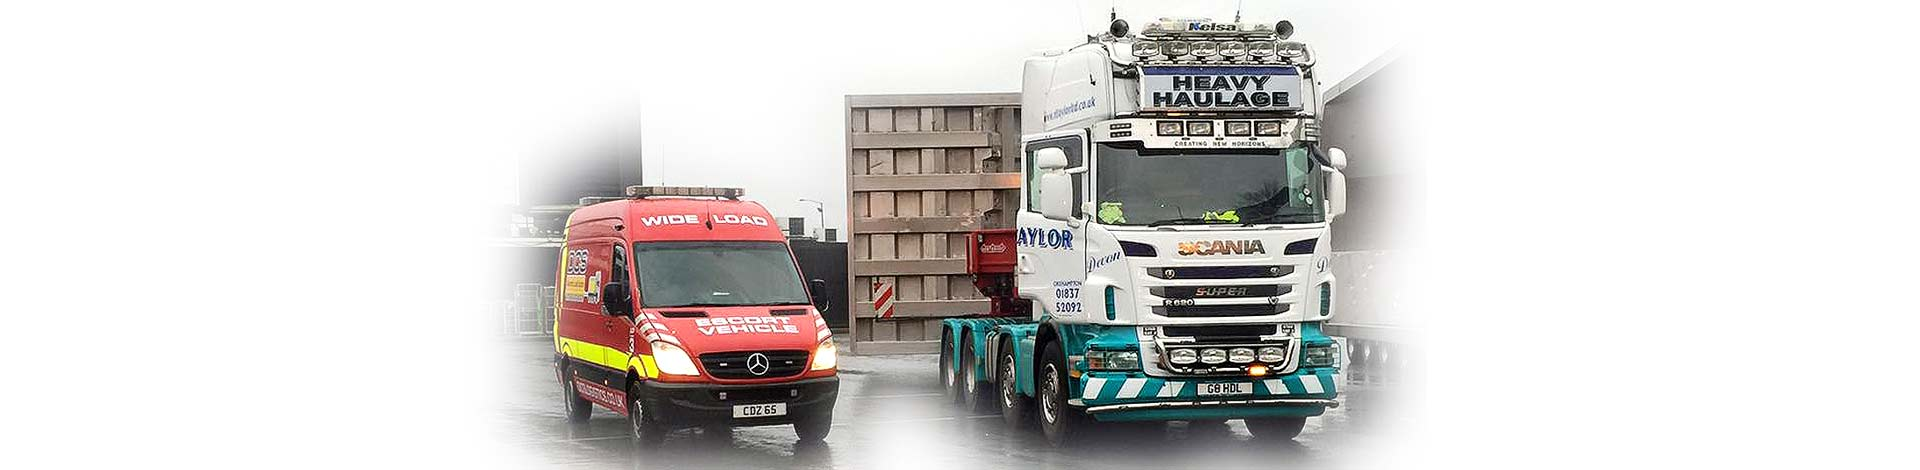 piolot-cars-from-DCS-logistics